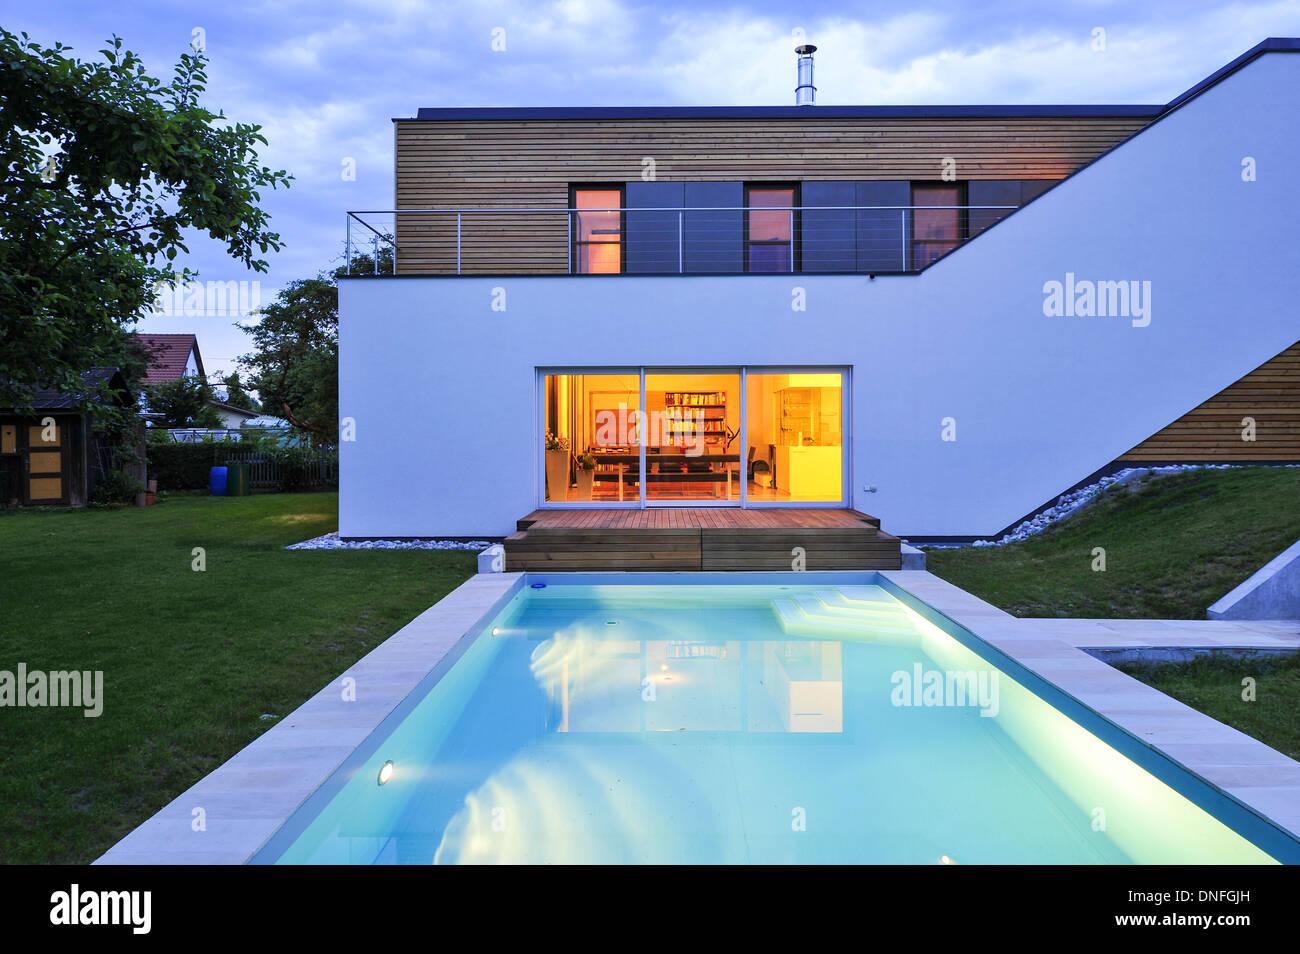 Wohnhaus, Holzbau, Swimming Pool, moderne Architektur, Holzhaus ...